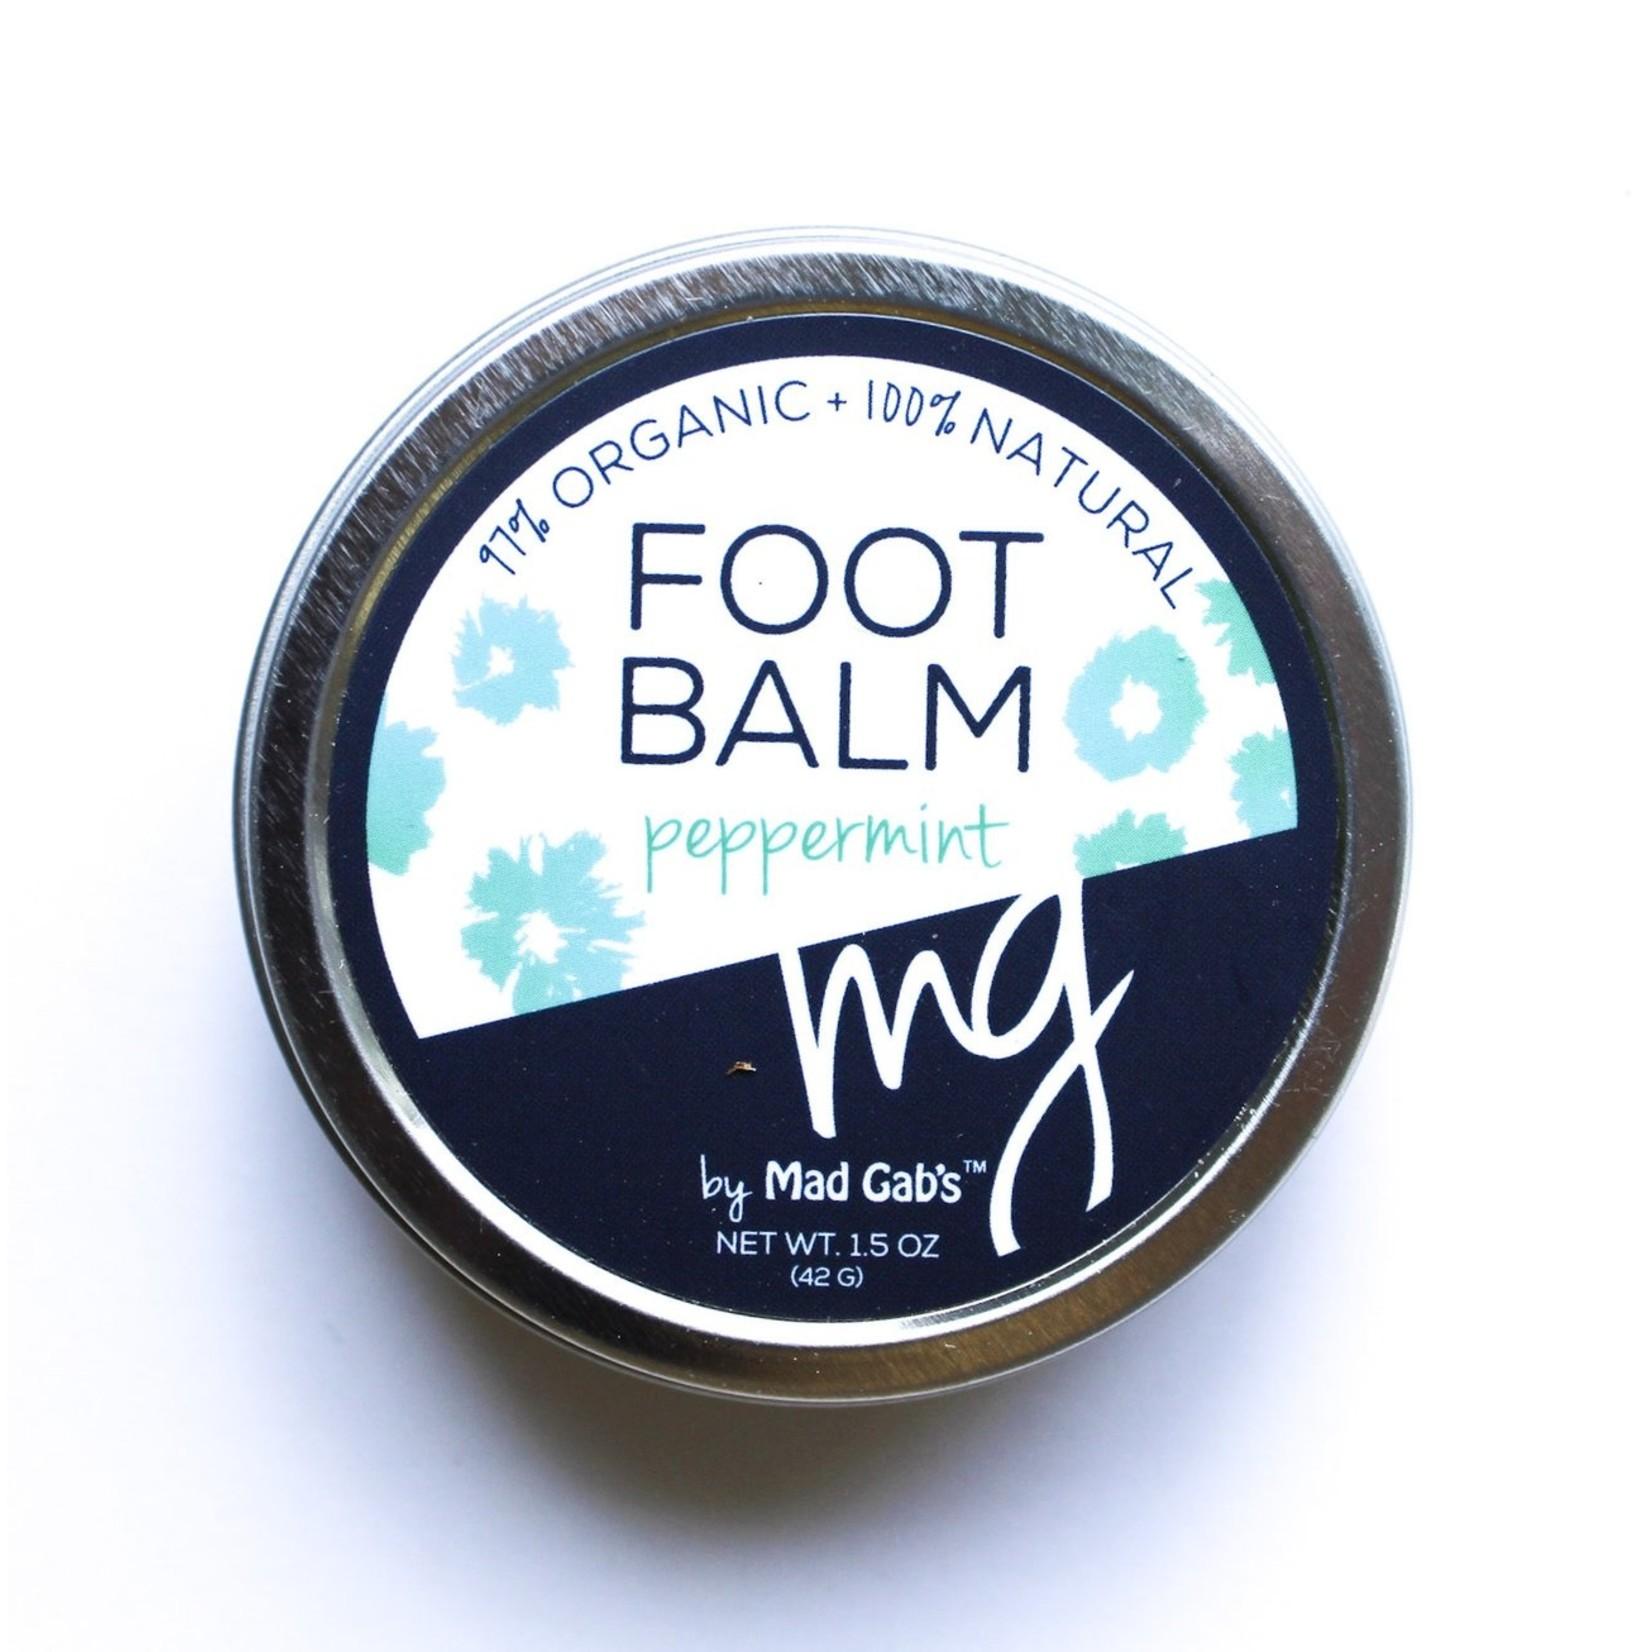 Mad Gab's Mad Gab's Peppermint Foot Balm